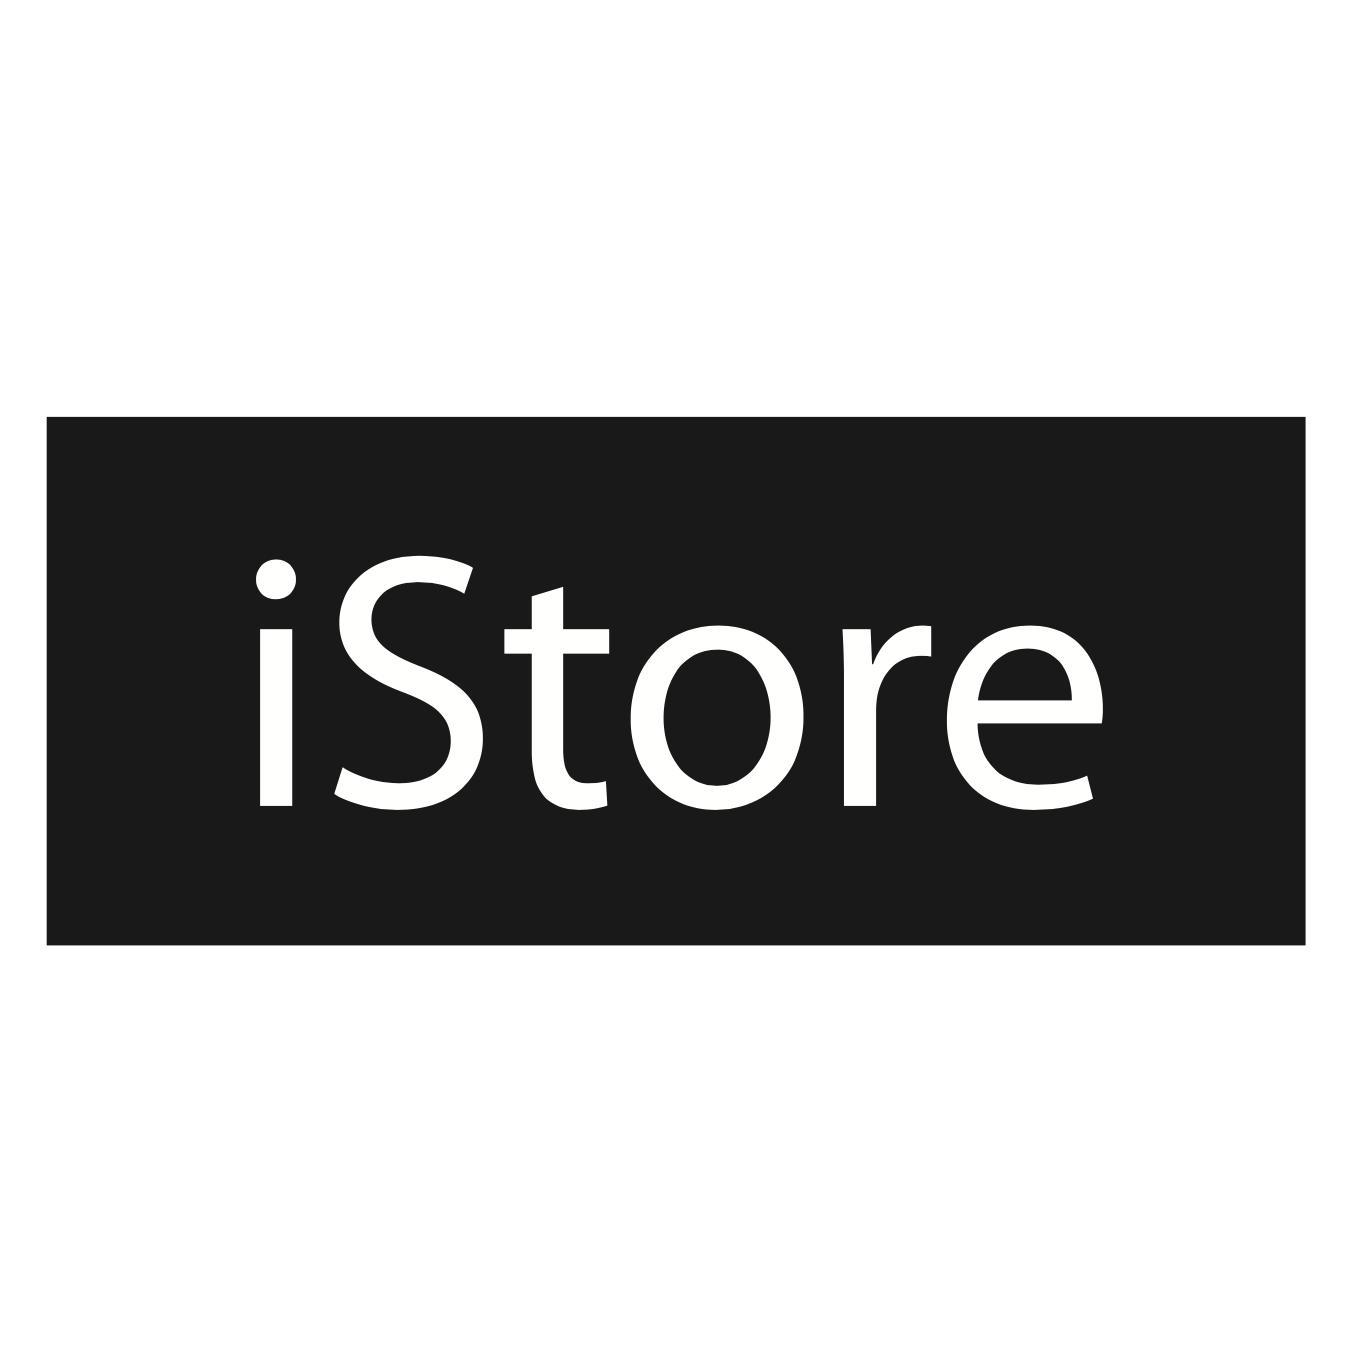 iPhone 6 Plus Silicone Case - Red